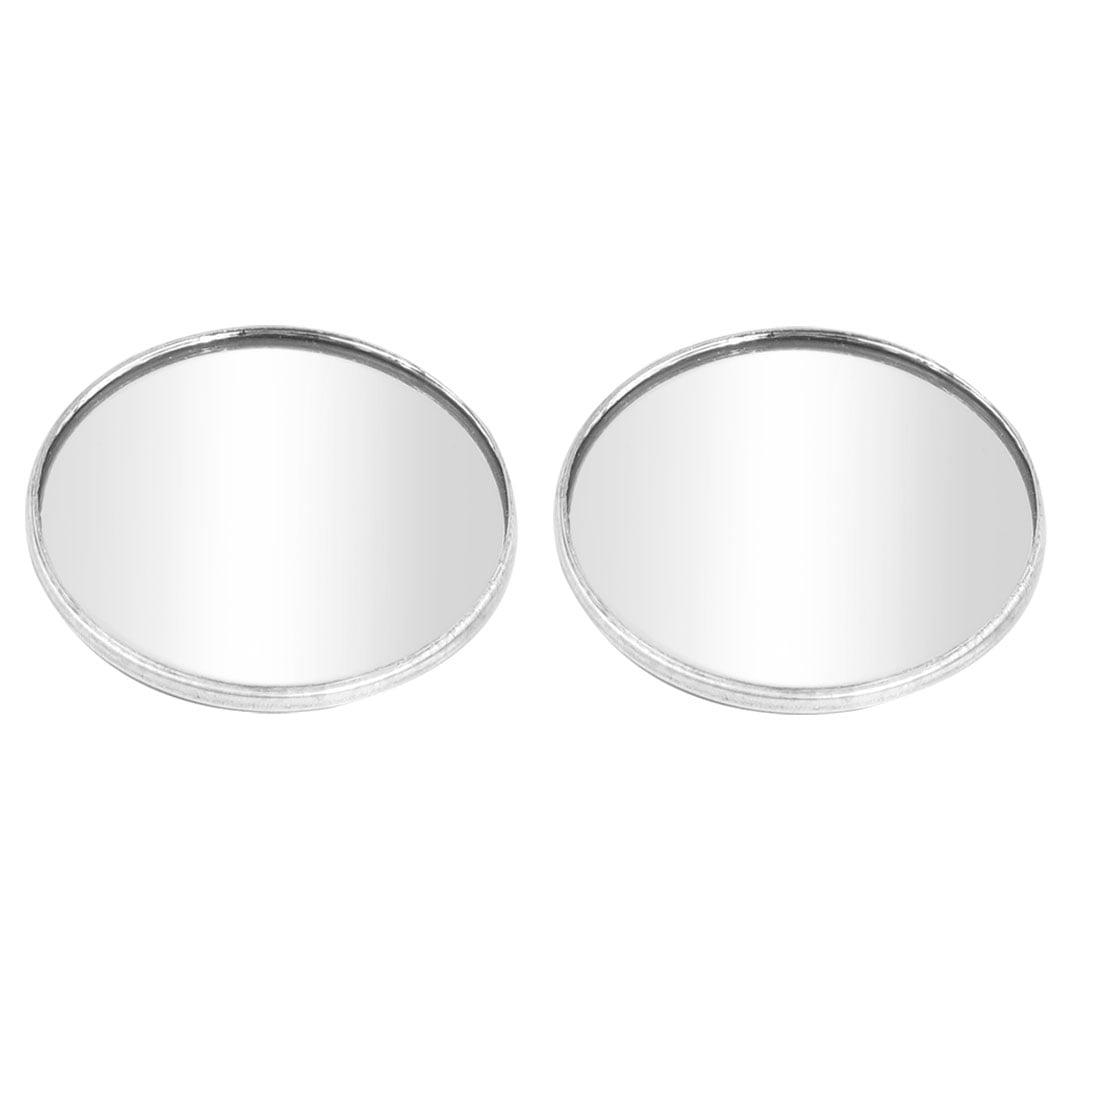 "2pcs 1.9"" Dia Round Wide Angle Convex Auto Car Mirror Blind Spot Silver Tone - image 1 of 1"